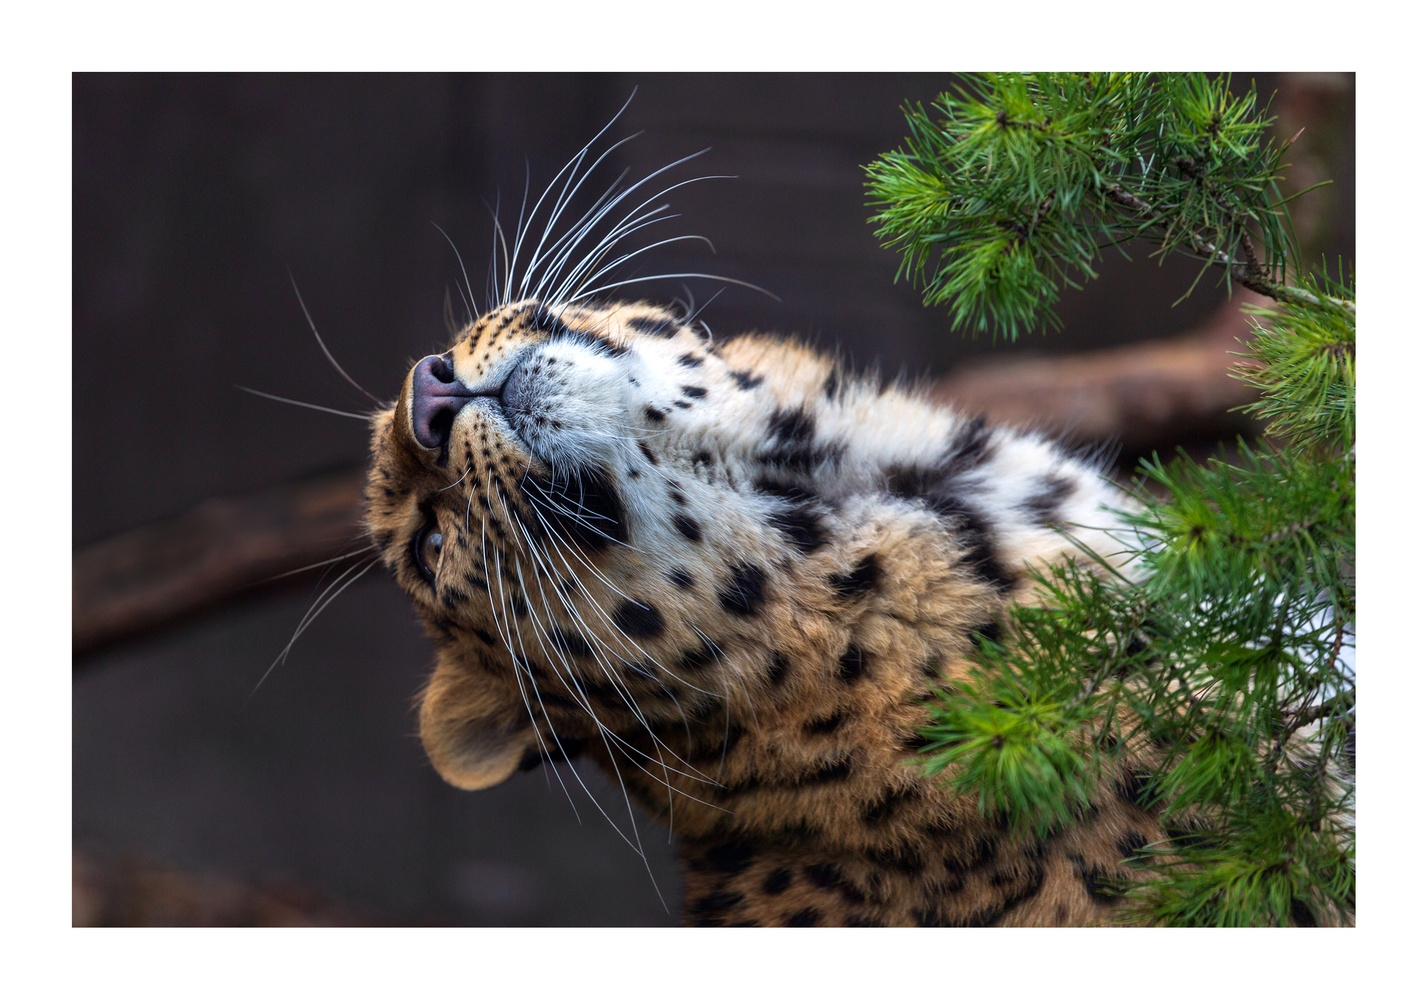 Amur Leopard (Panthera pardus orientalis) by Clare Lusher